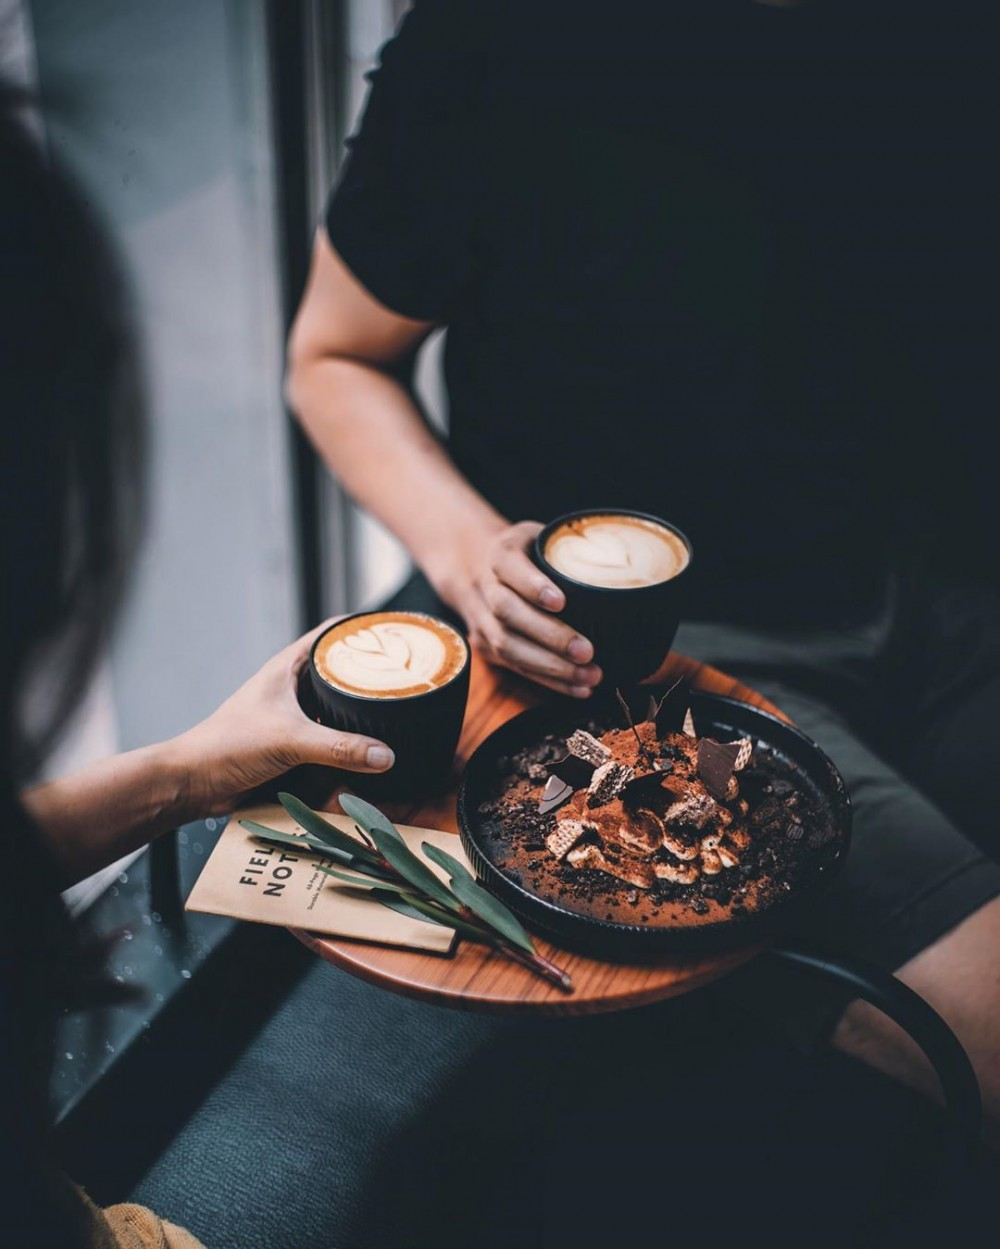 hk_foodblog's Instagram